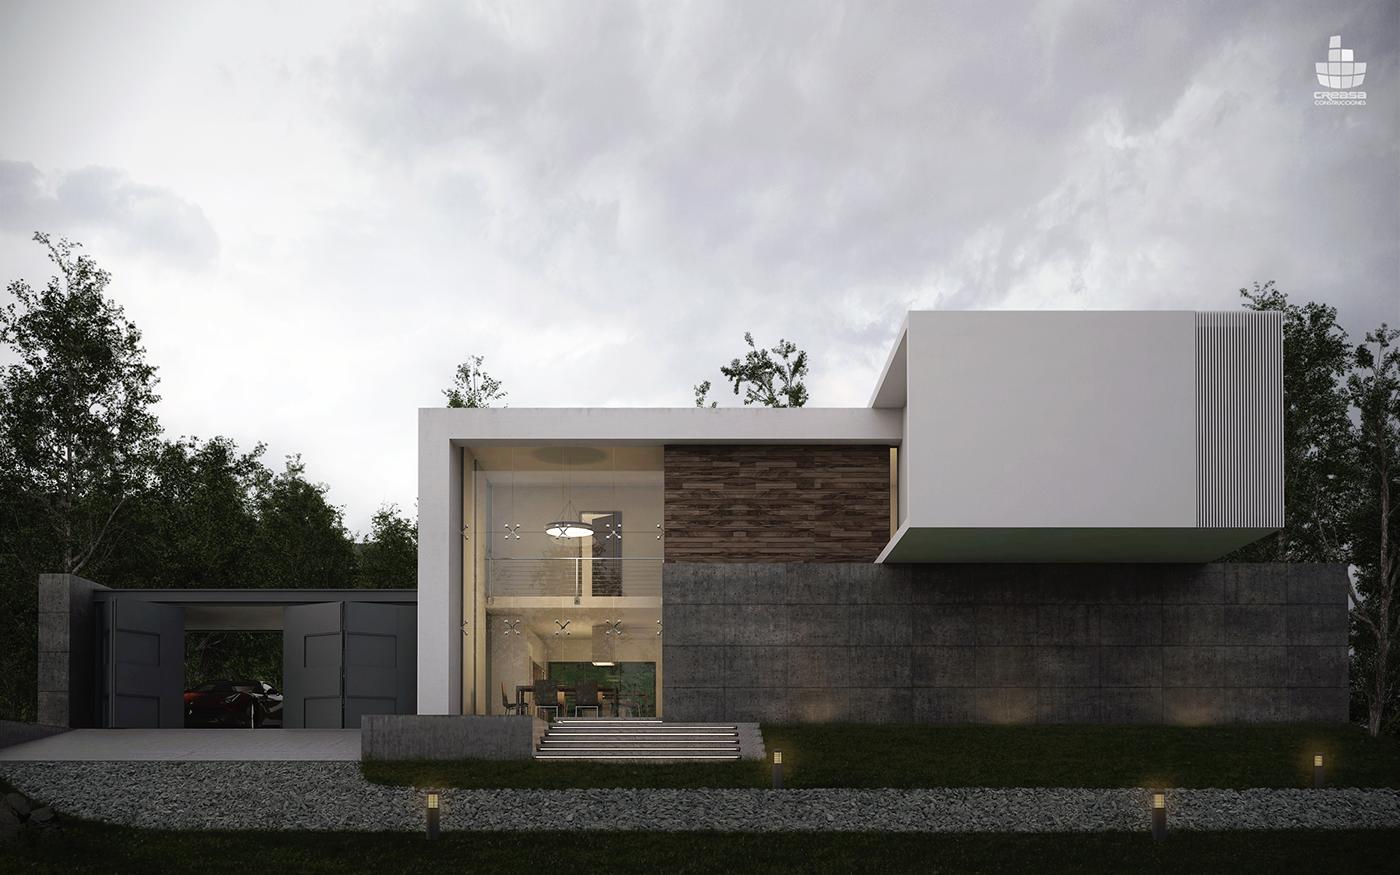 Domus saltus on behance - Arquitectura minimalista ...